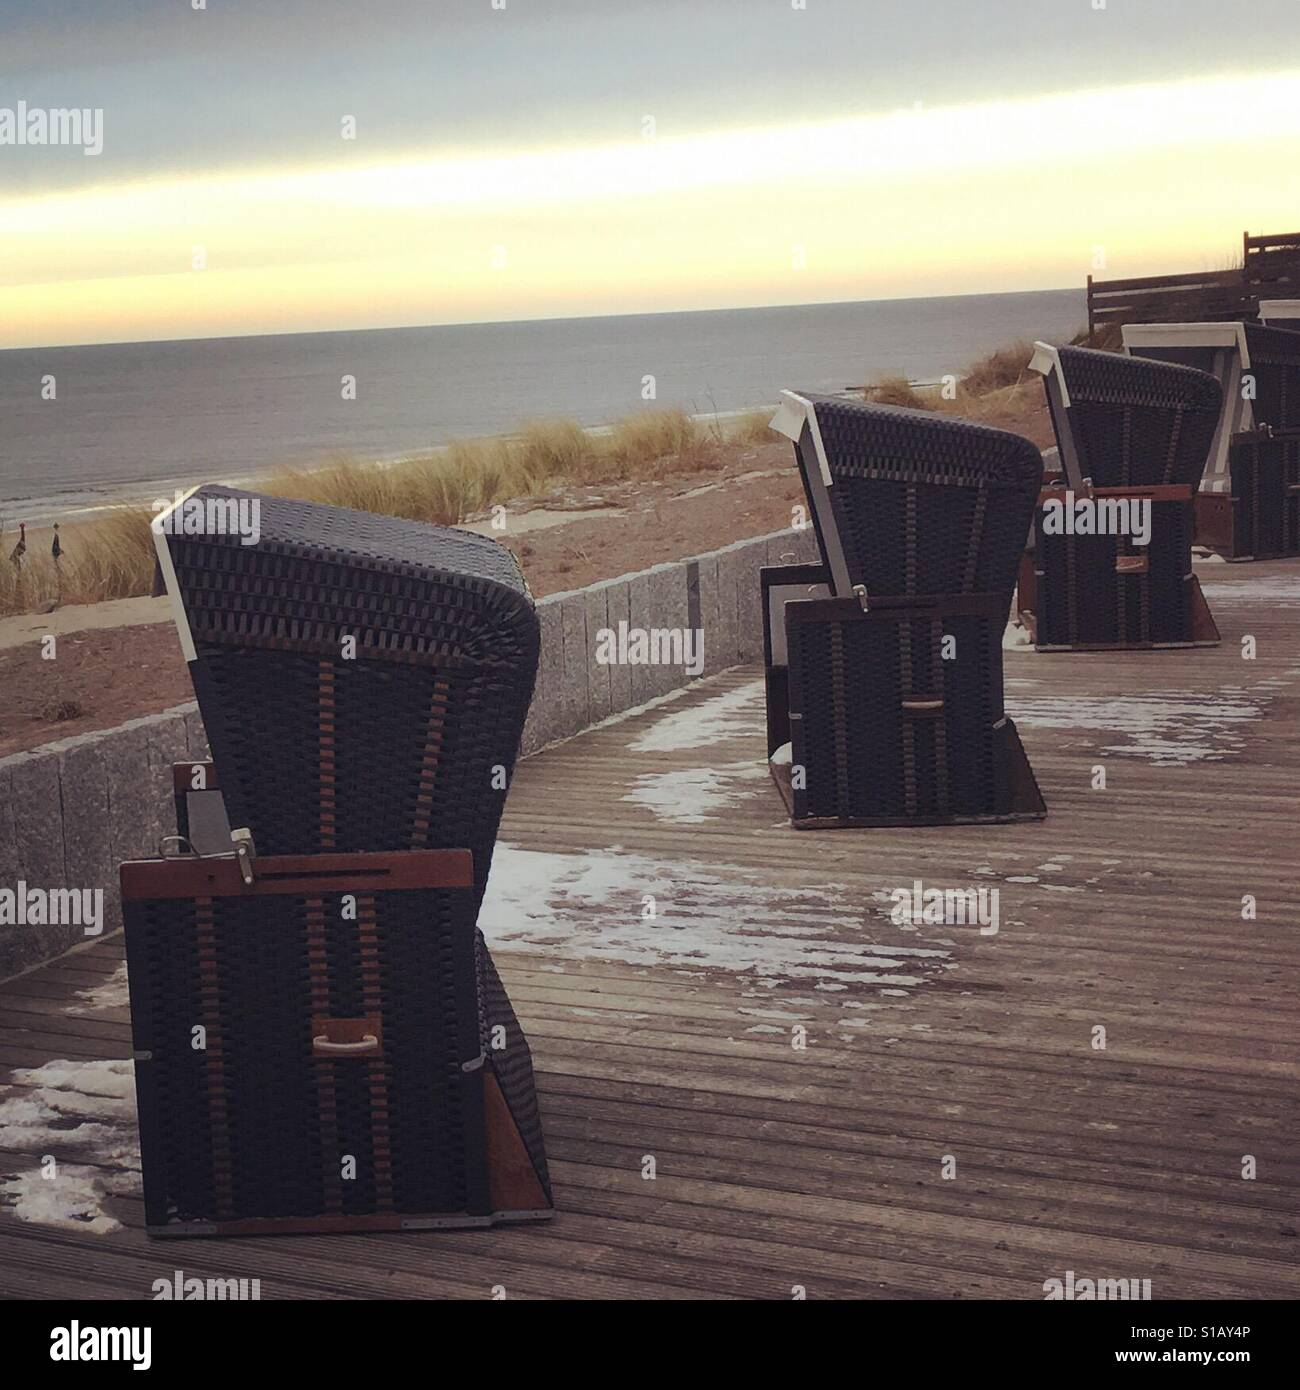 Strandkörbe auf Sylt (2017) - Stock Image